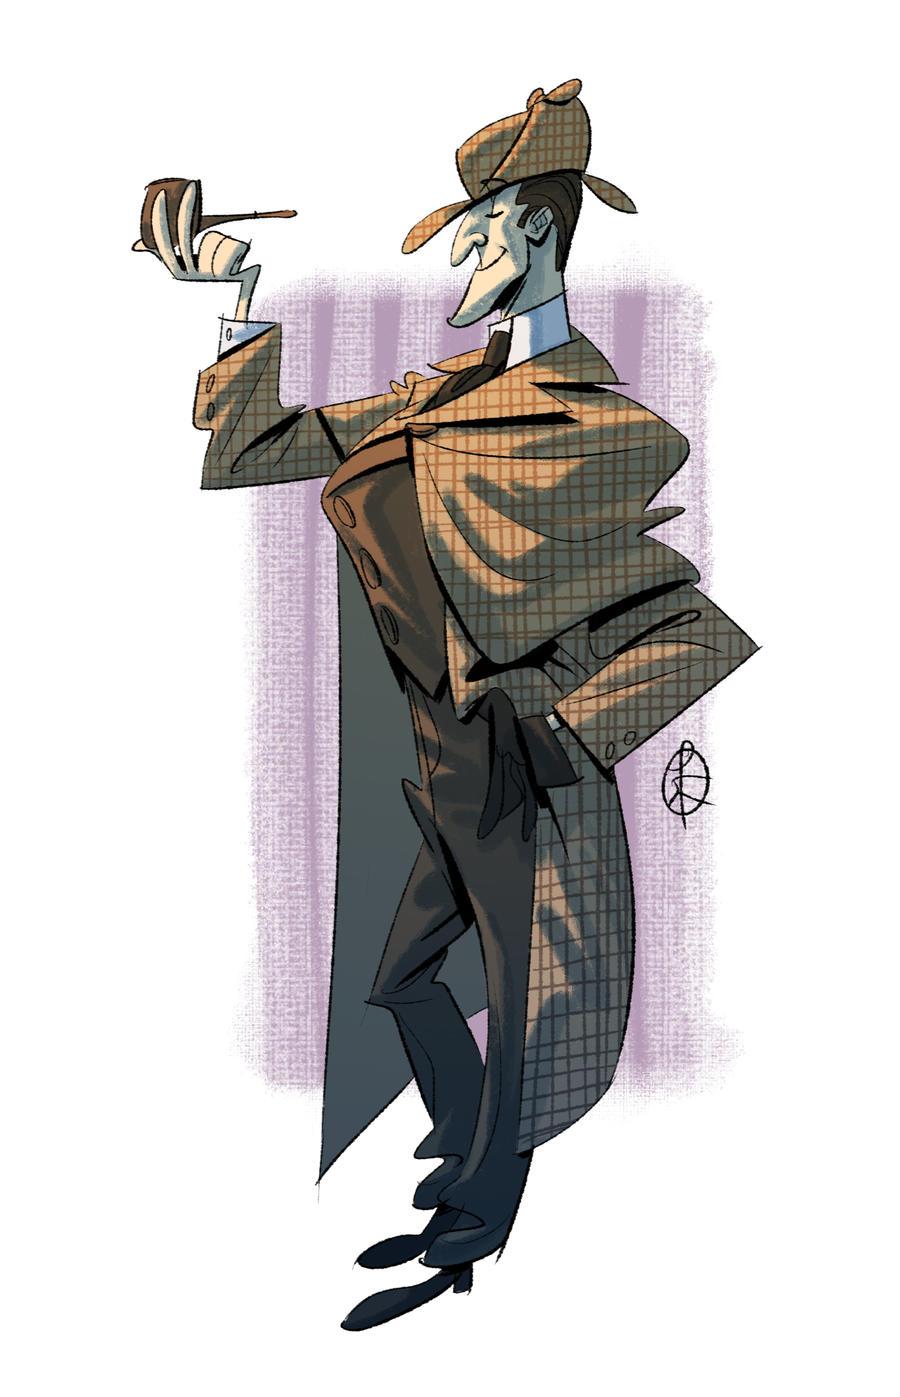 http://splendidriver.deviantart.com/art/The-real-Sherlock-Holmes-436324557